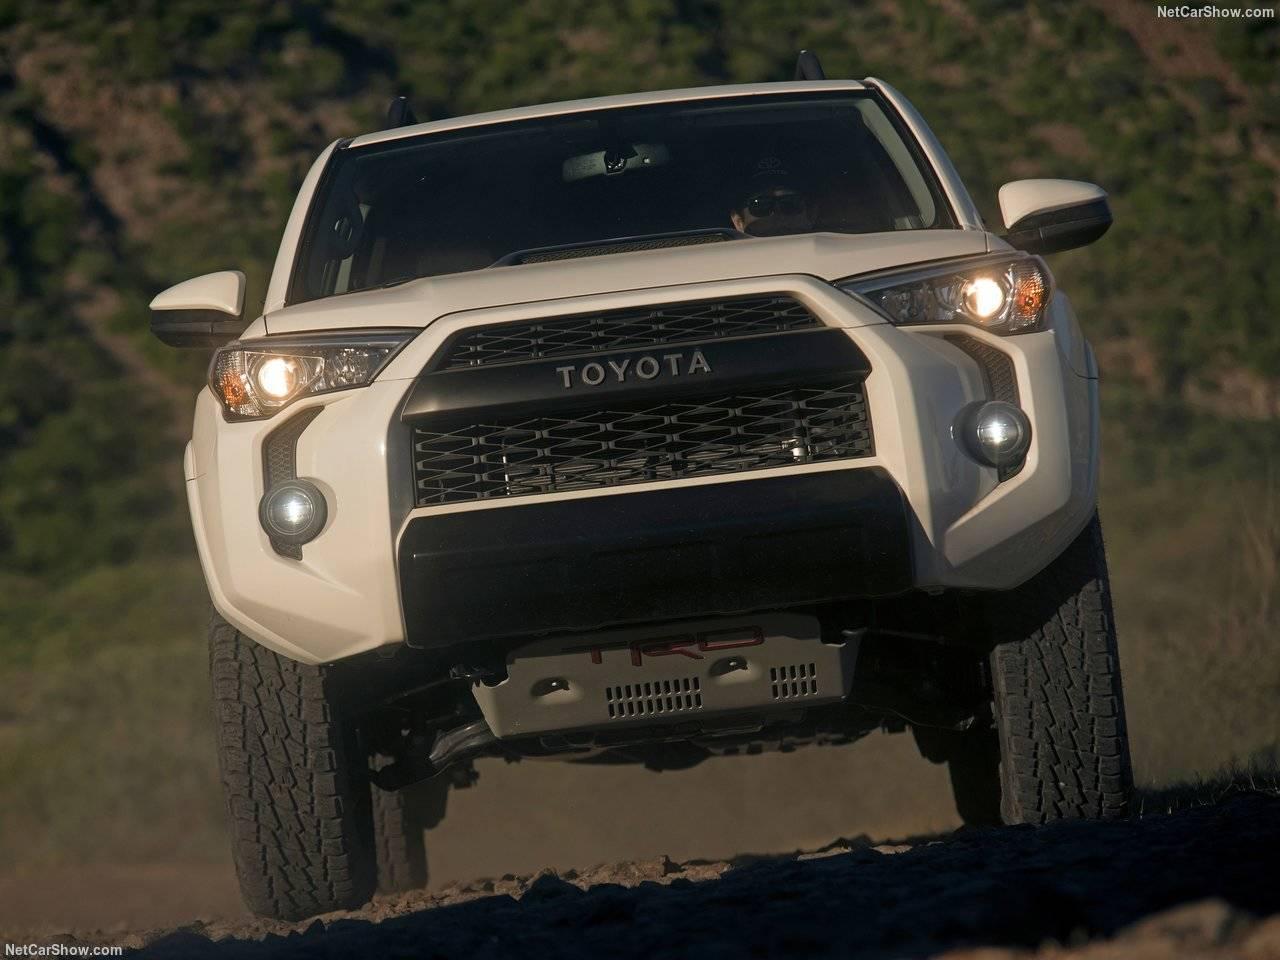 Toyota 4Runner TRD Pro (2019)が、アップデート!TRD Proシリーズは、サスペンション周りを専用チューンアップ!